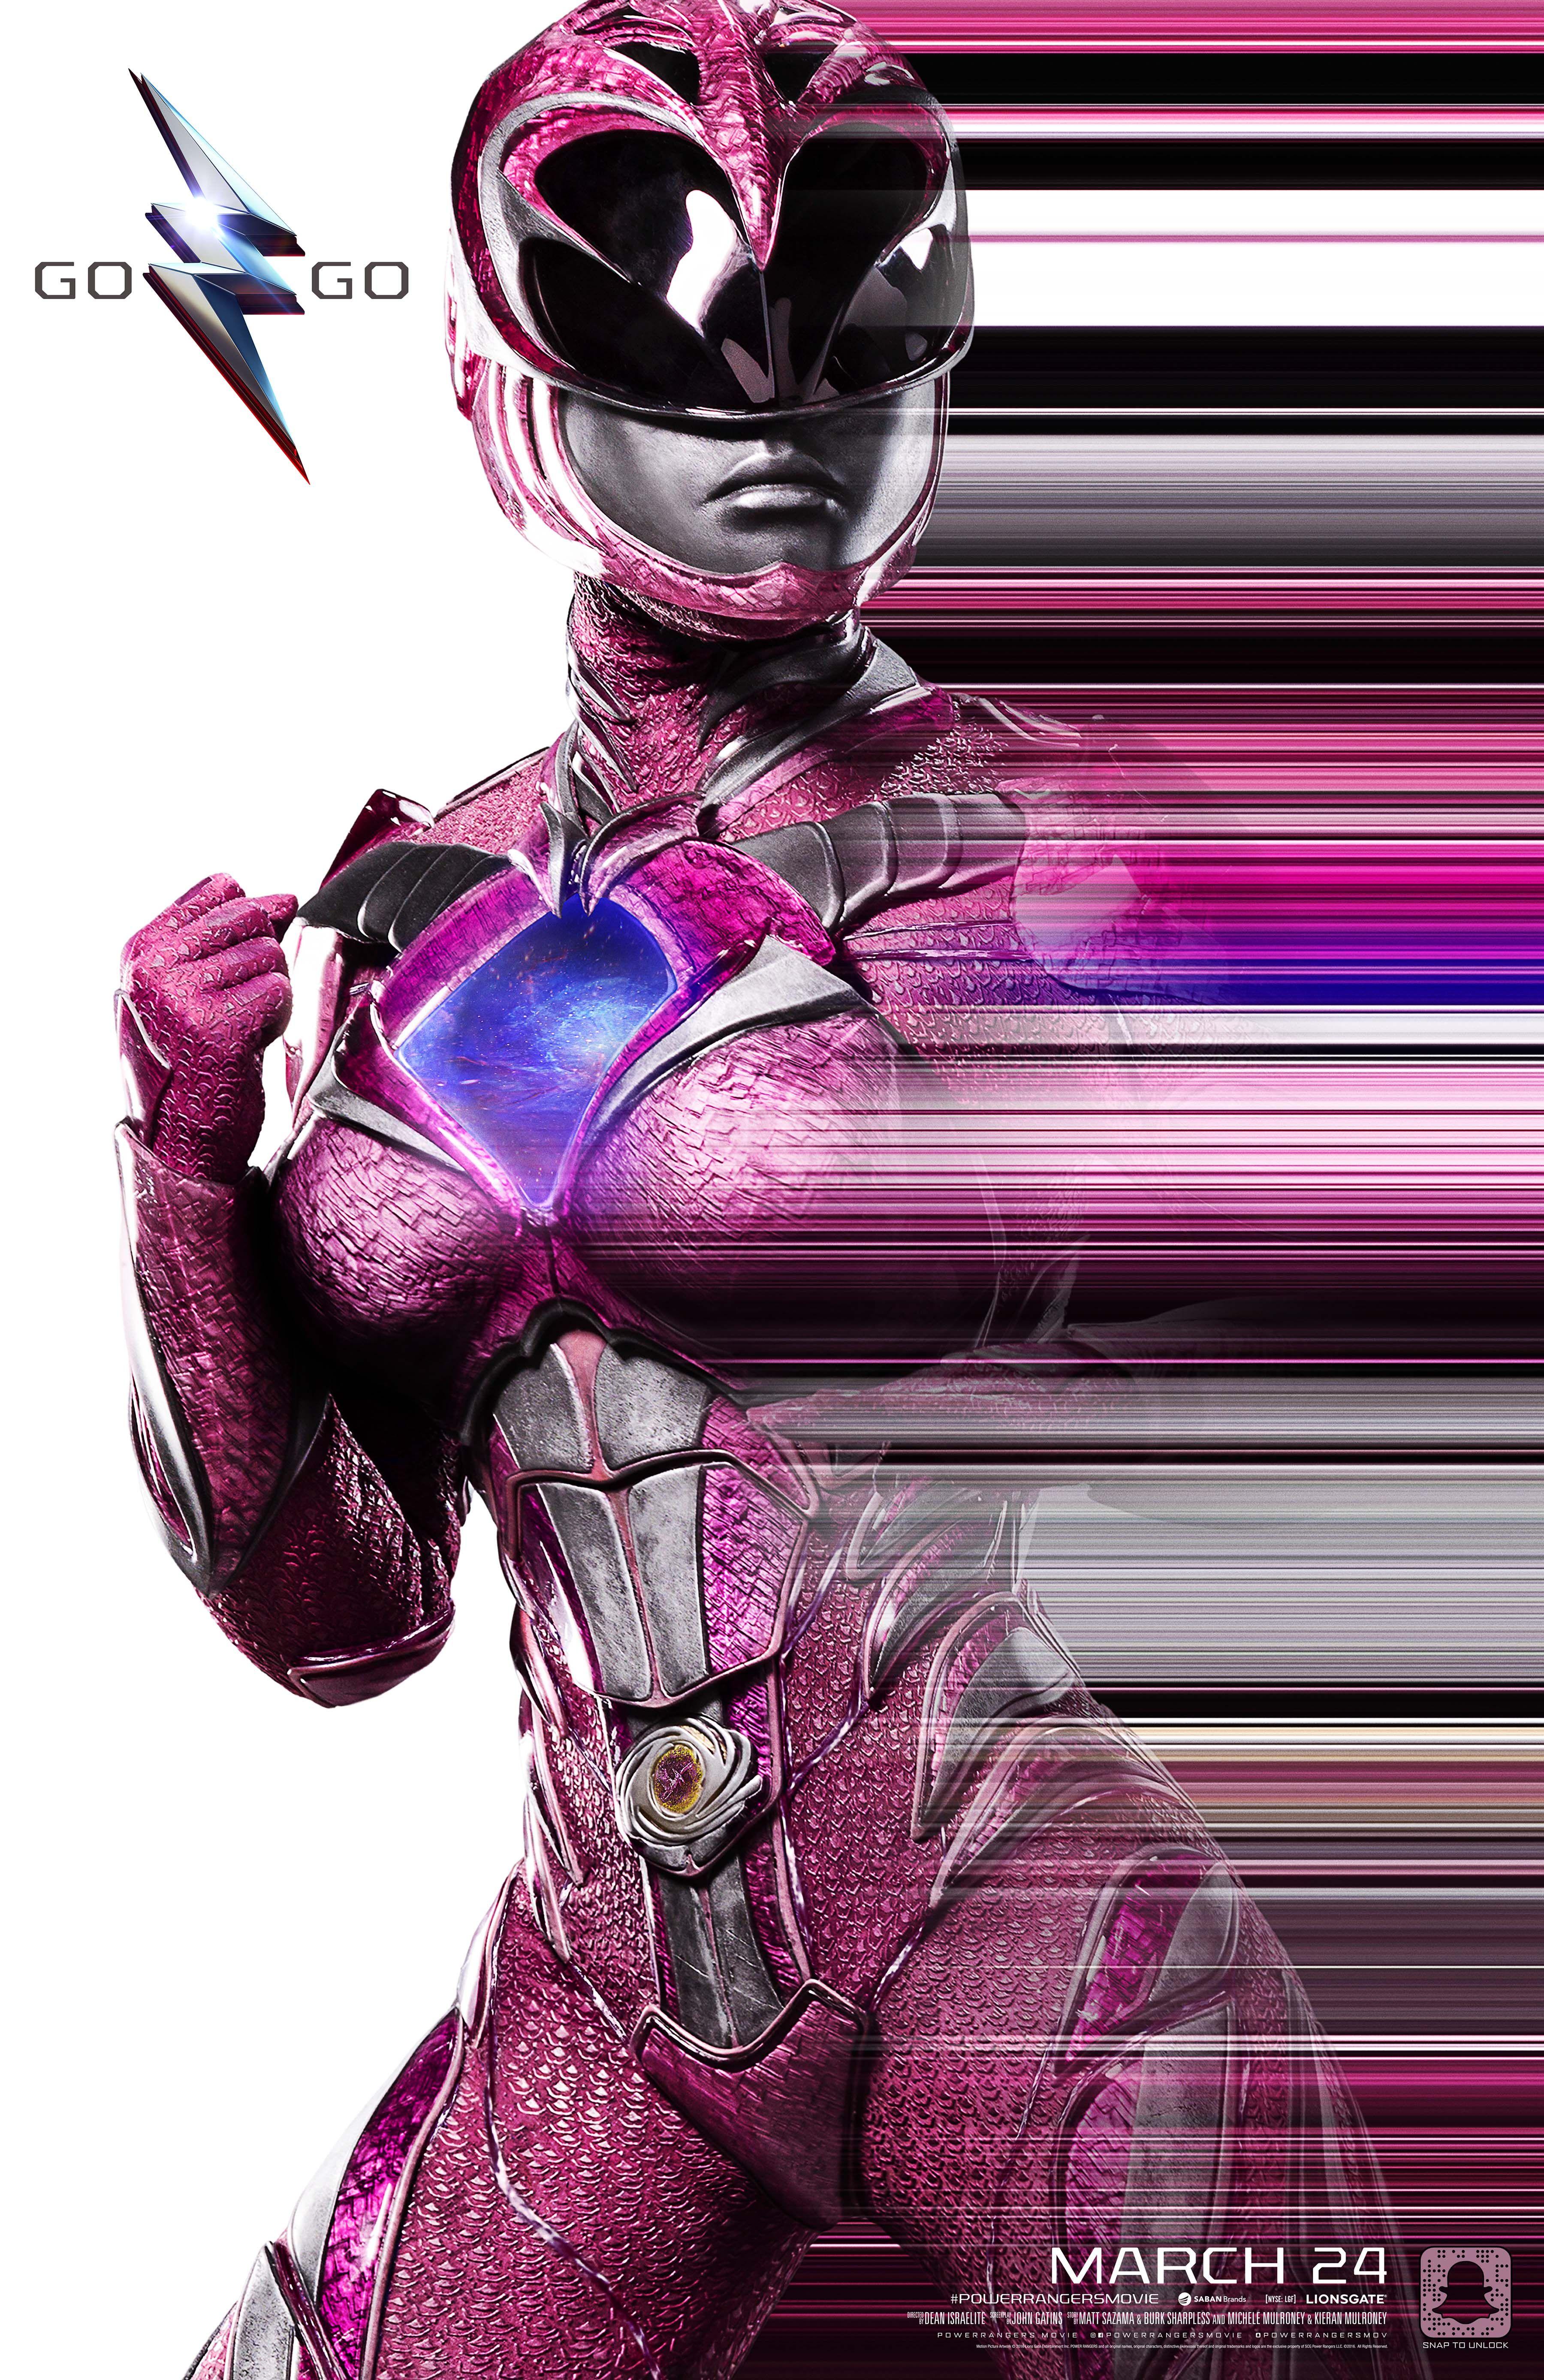 9c0788fc3 #GoGo Kimberly the #PinkRanger! #PowerRangersMovie - In theaters March 24,  2017.